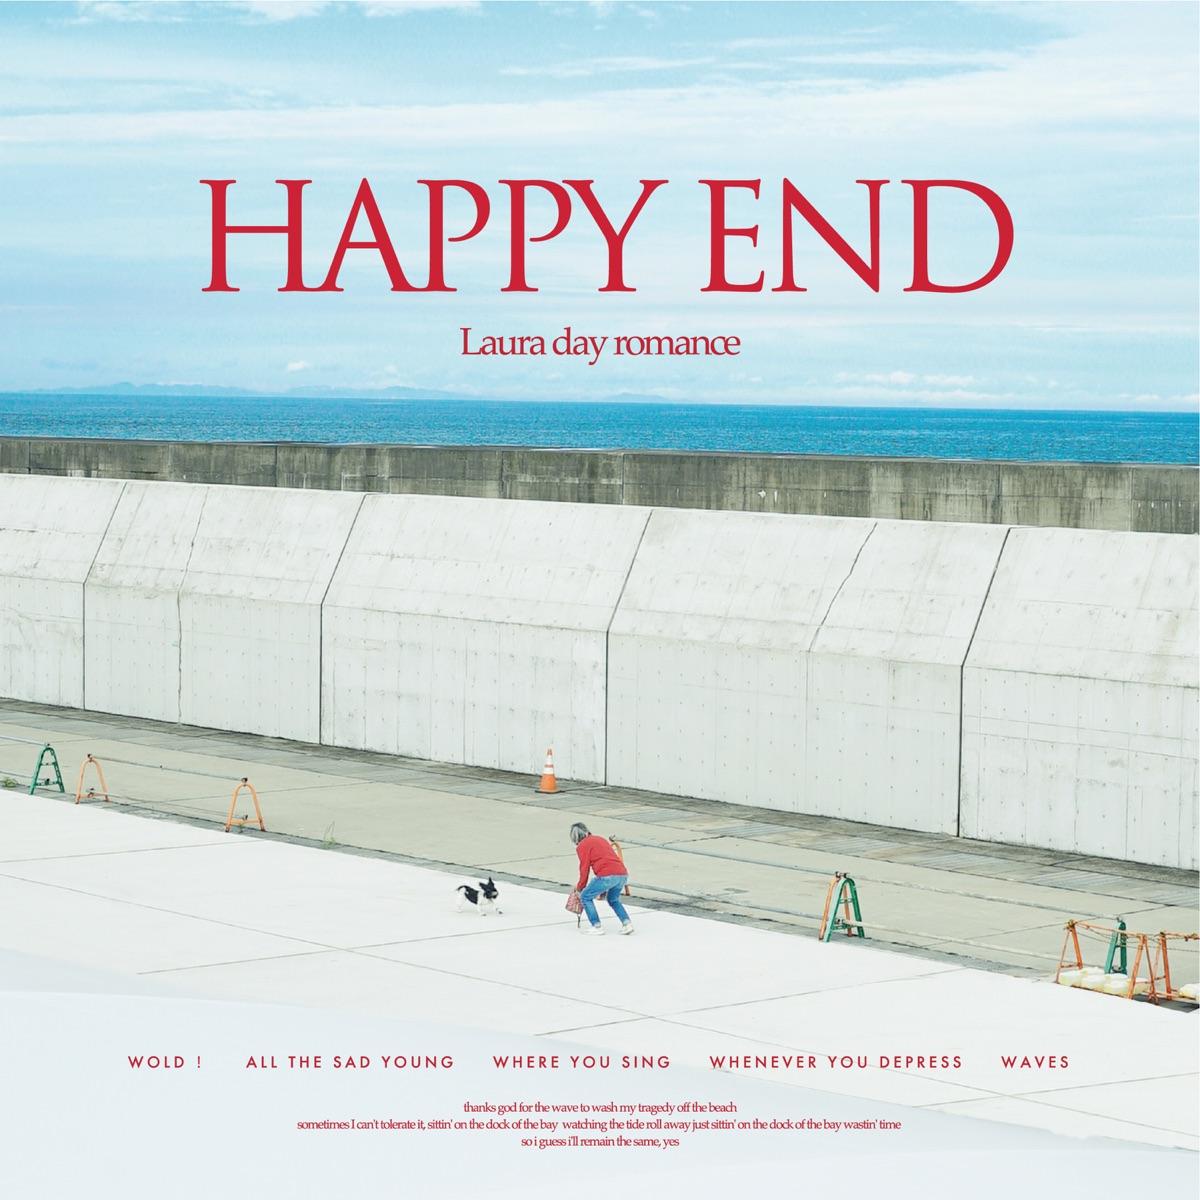 『Laura day romance - happyend』収録の『happyend』ジャケット